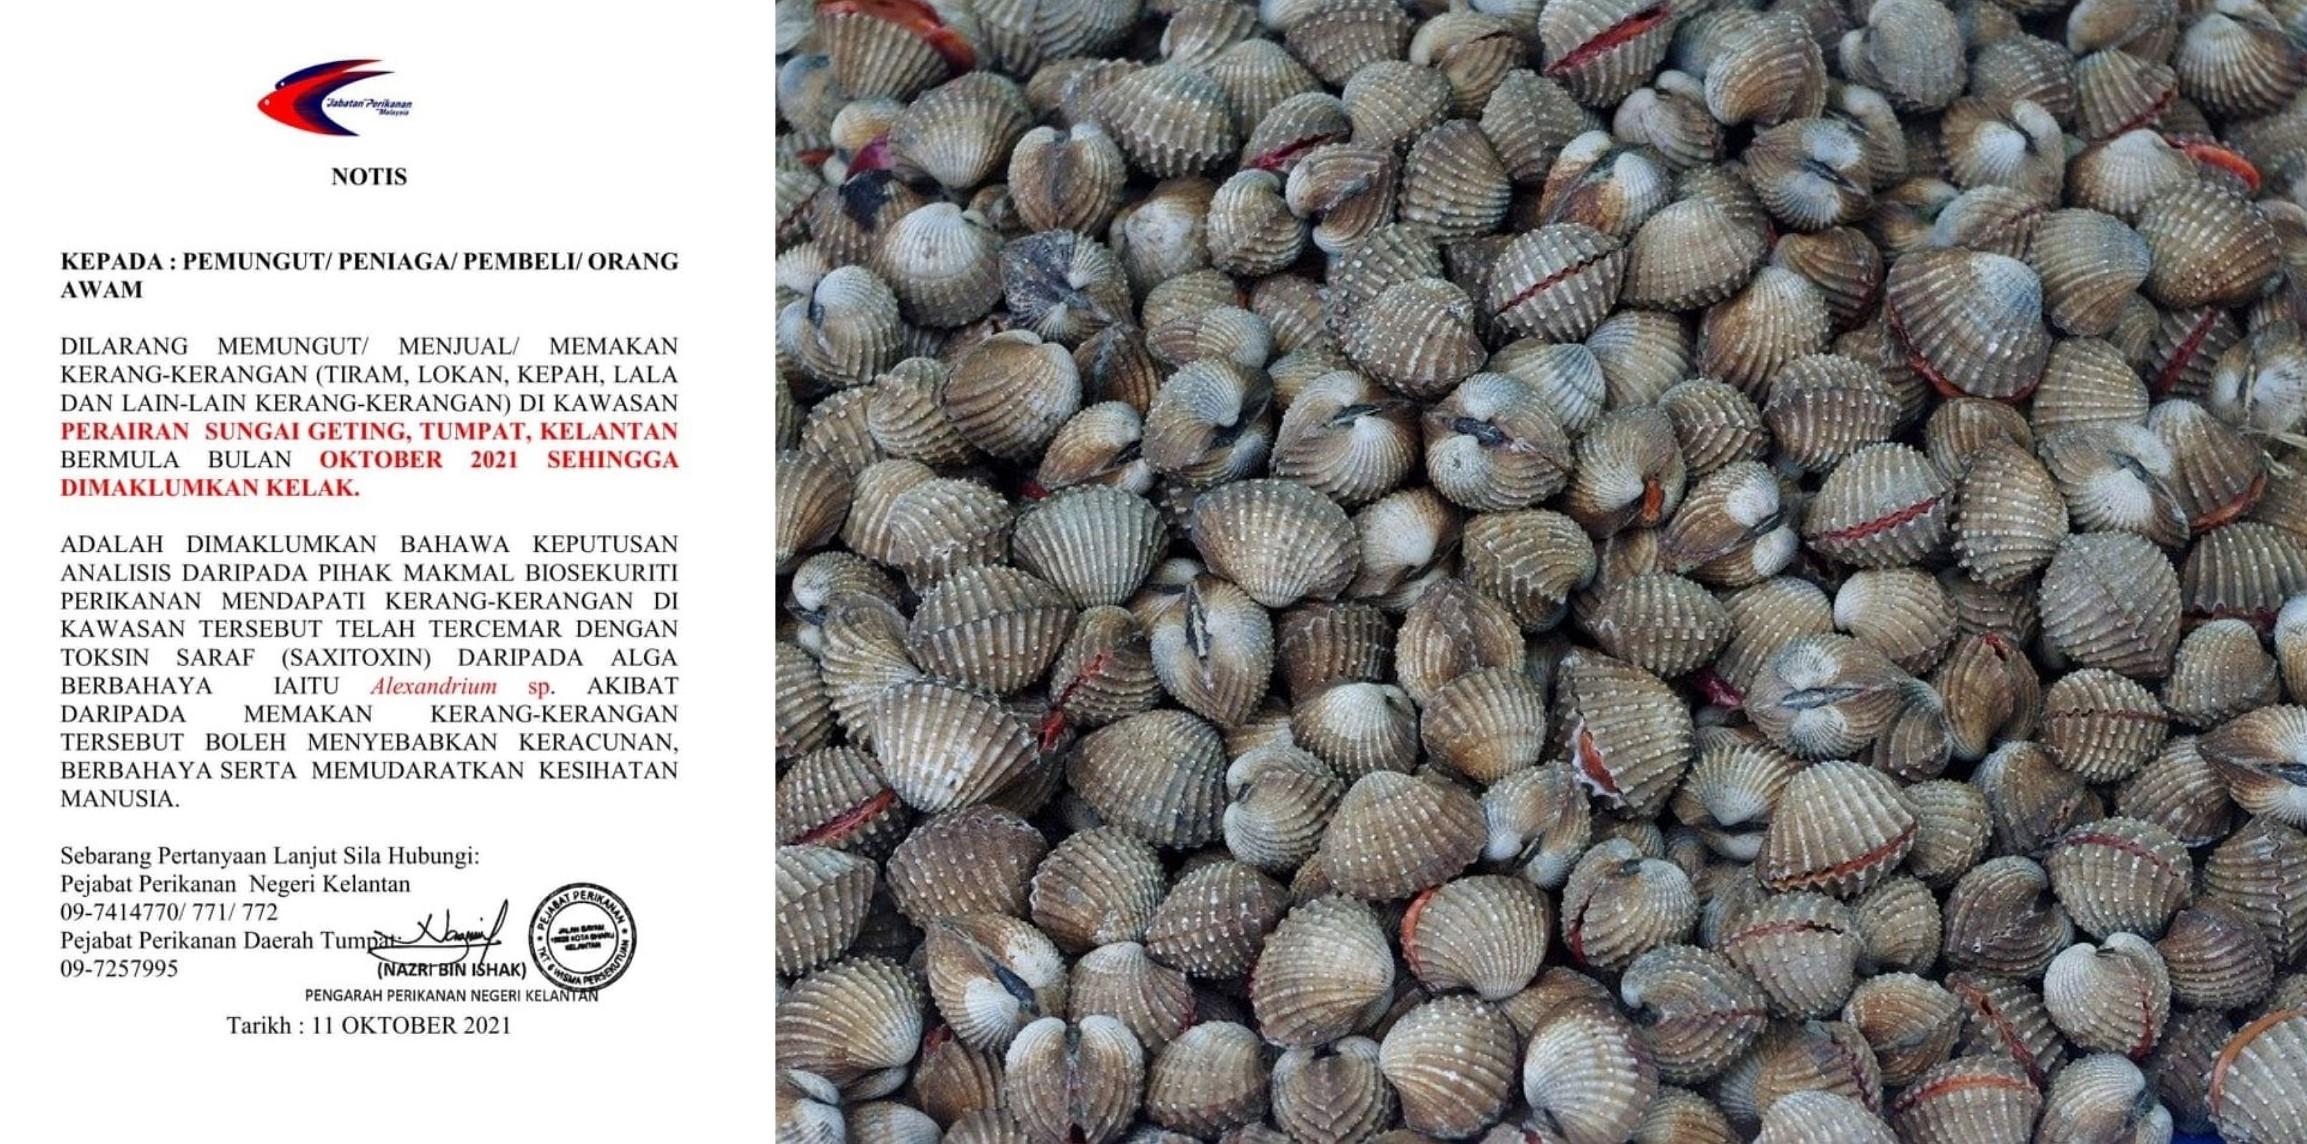 Shellfish Lovers Beware! Do Not Consume Shellfish From Kelantan As It Is Toxic!